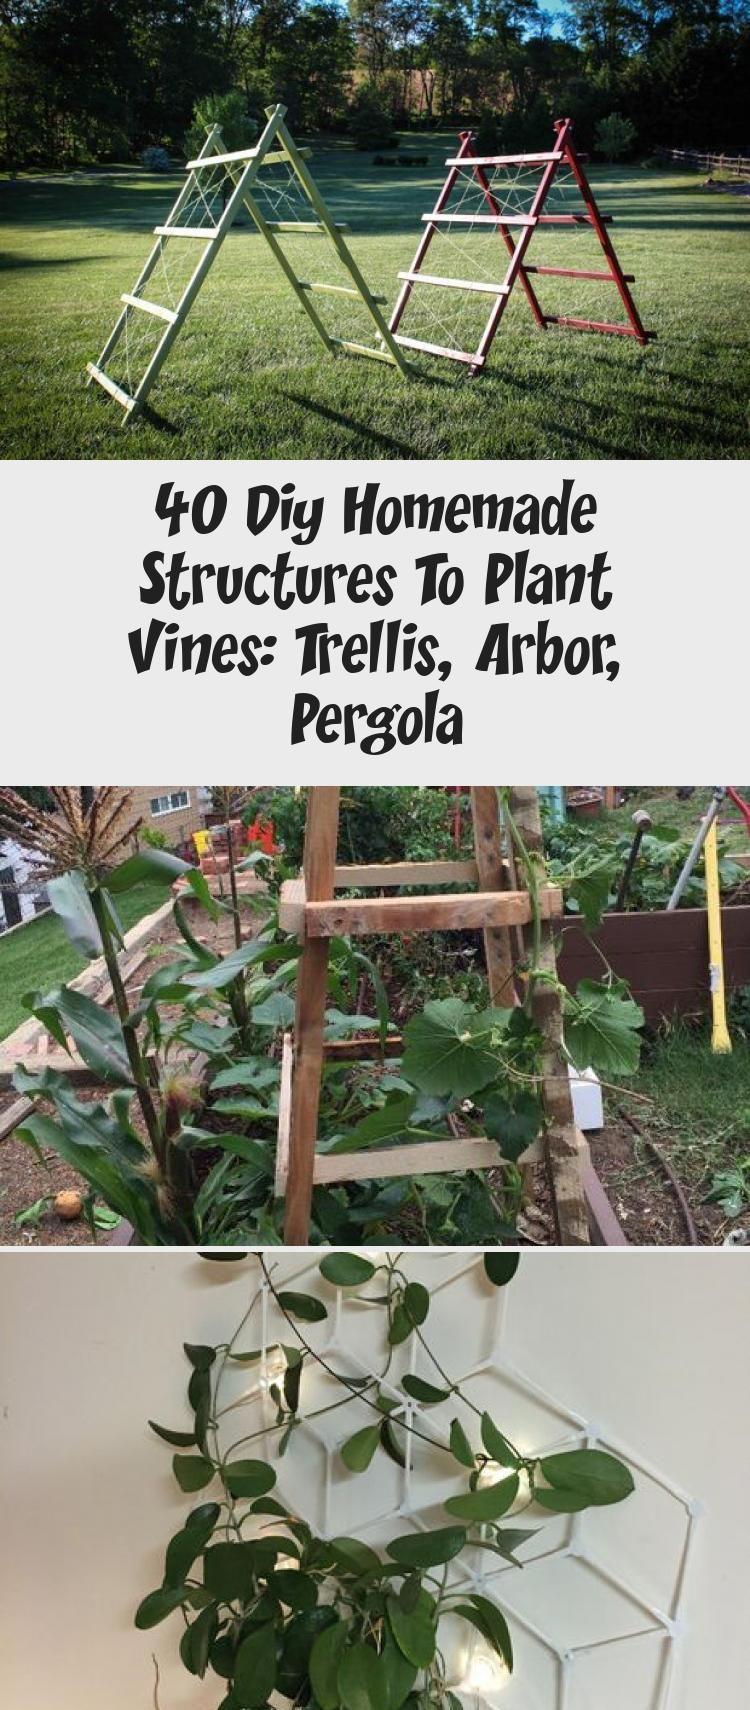 40 diy homemade structures to plant vines trellis arbor